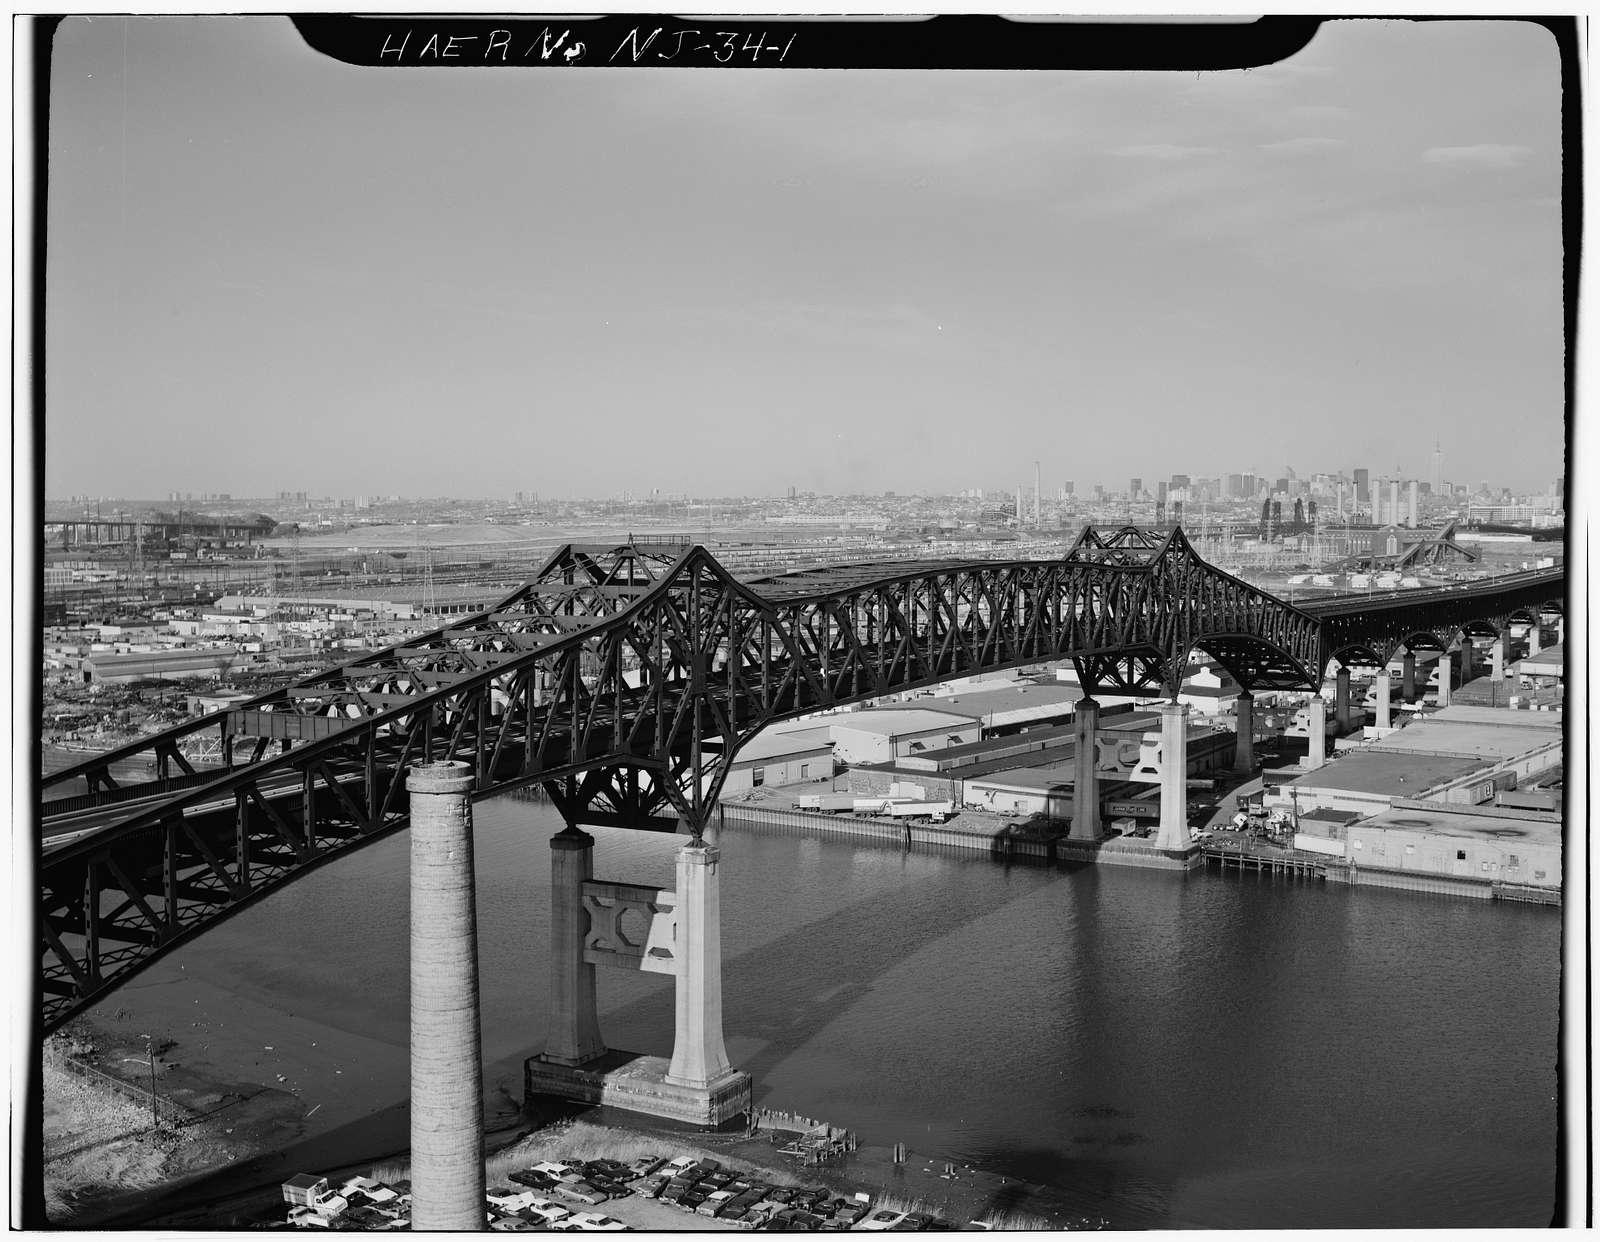 Pulaski Skyway, Spanning Passaic & Hackensack Rivers, Jersey City, Hudson County, NJ